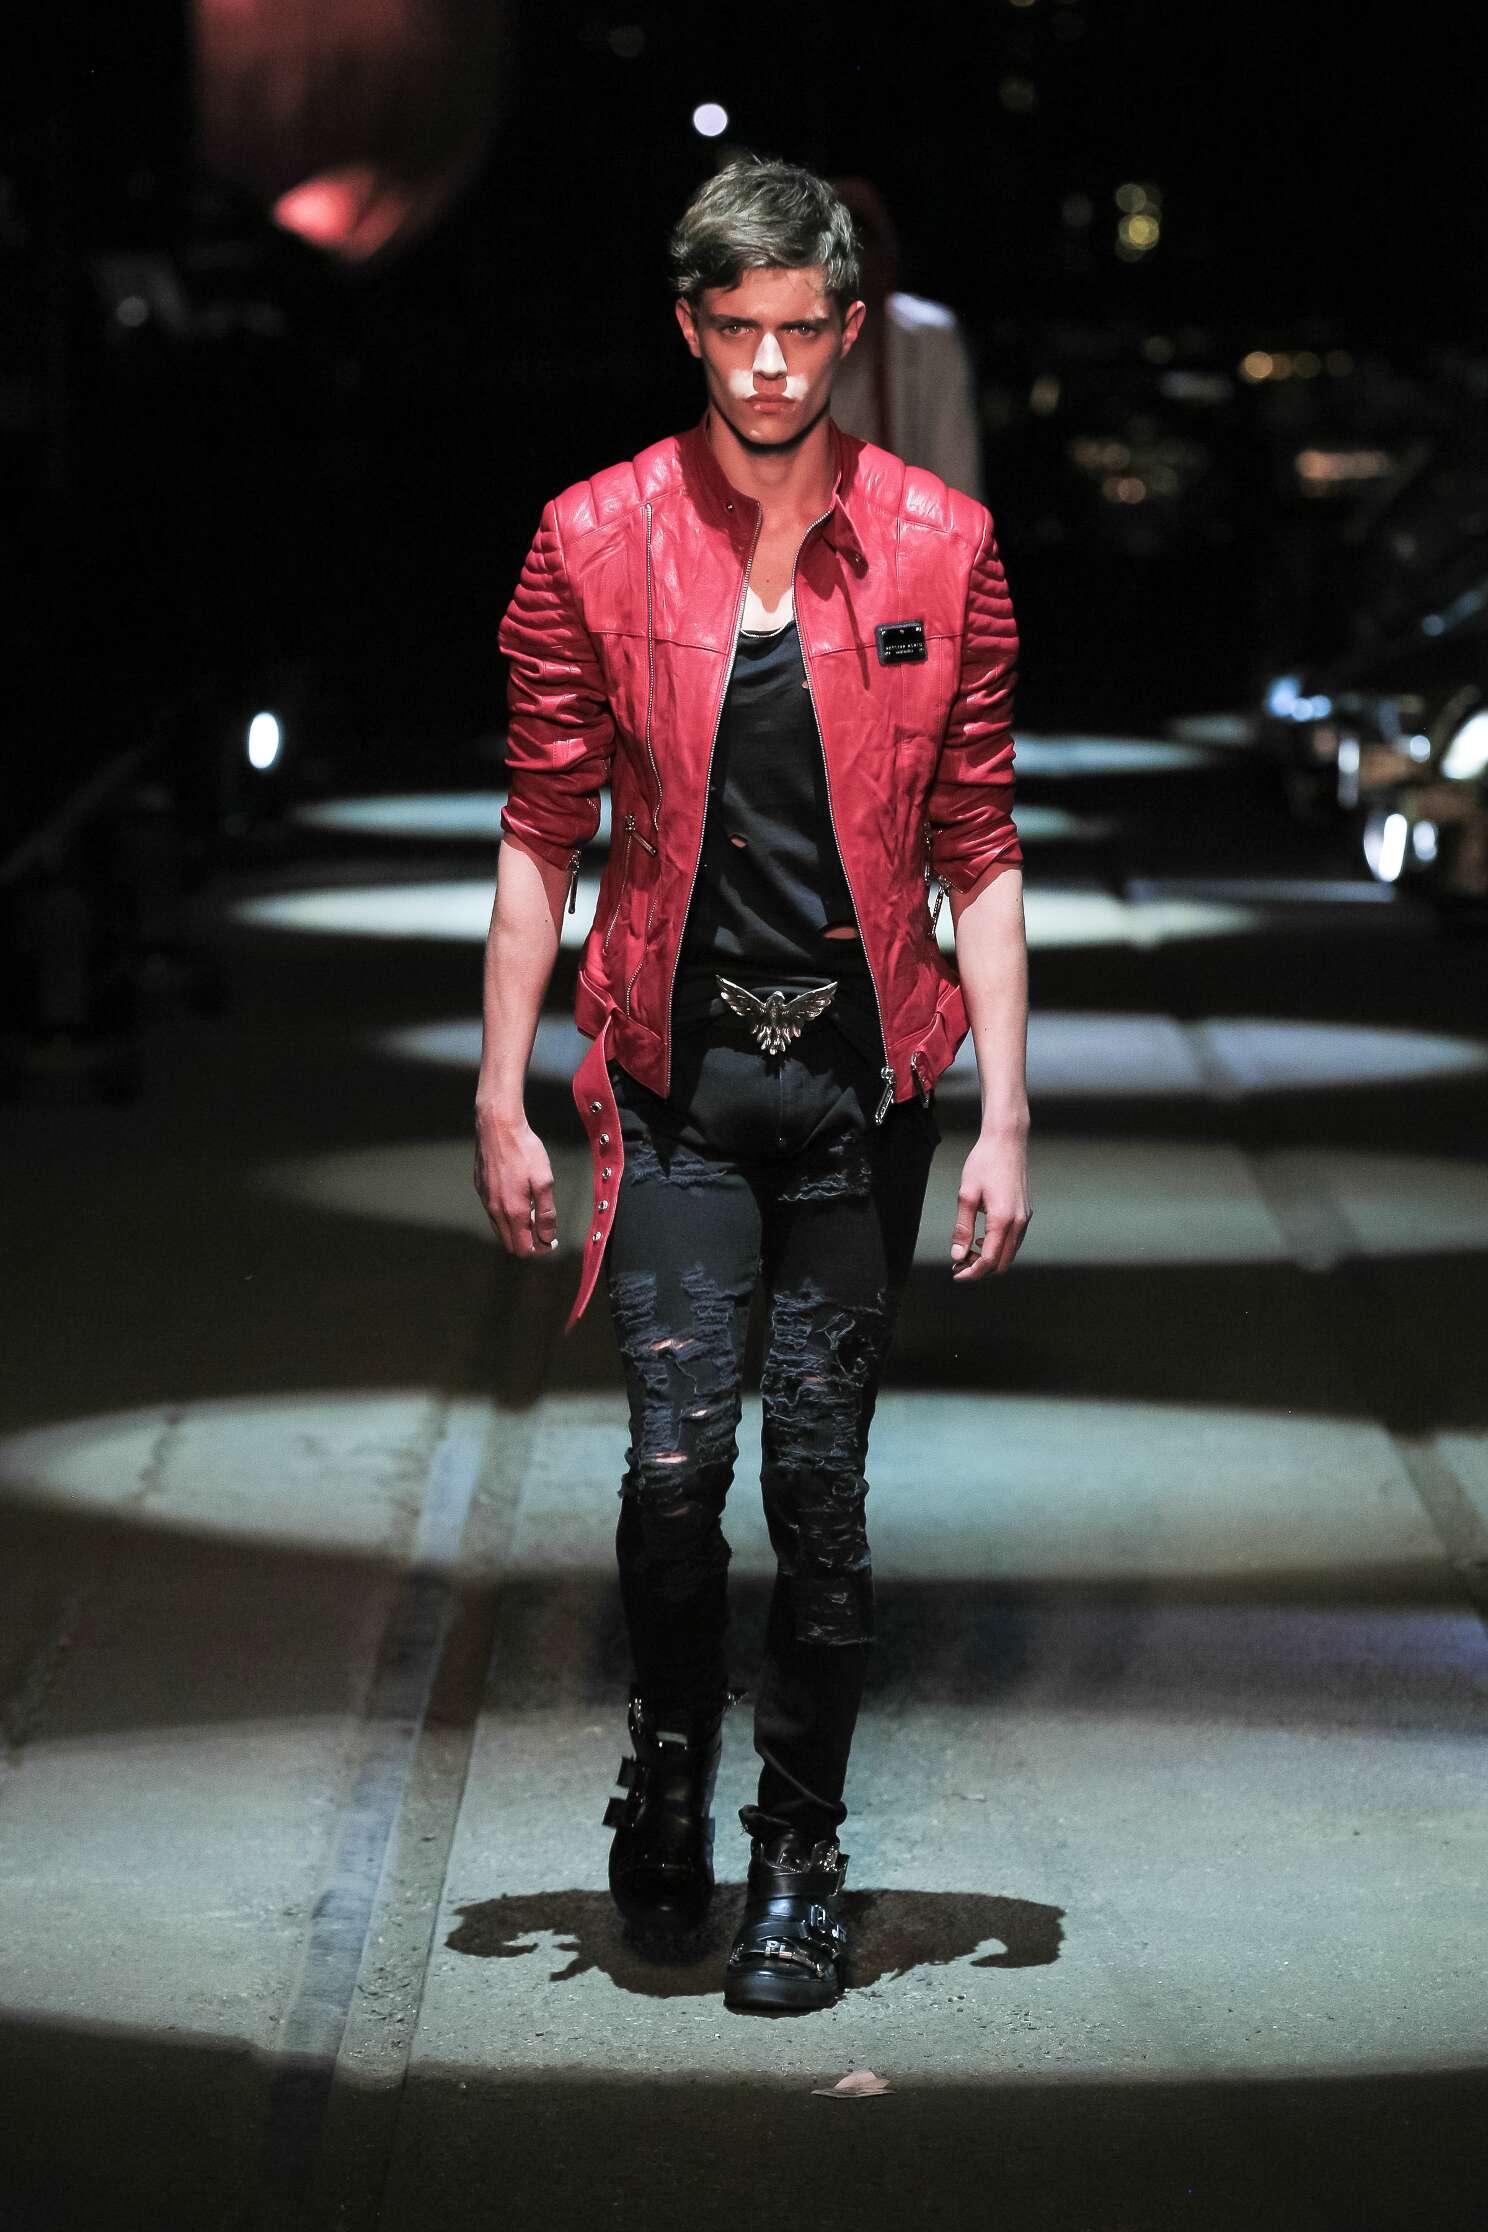 Philipp Plein Collection Man Milan Fashion Week